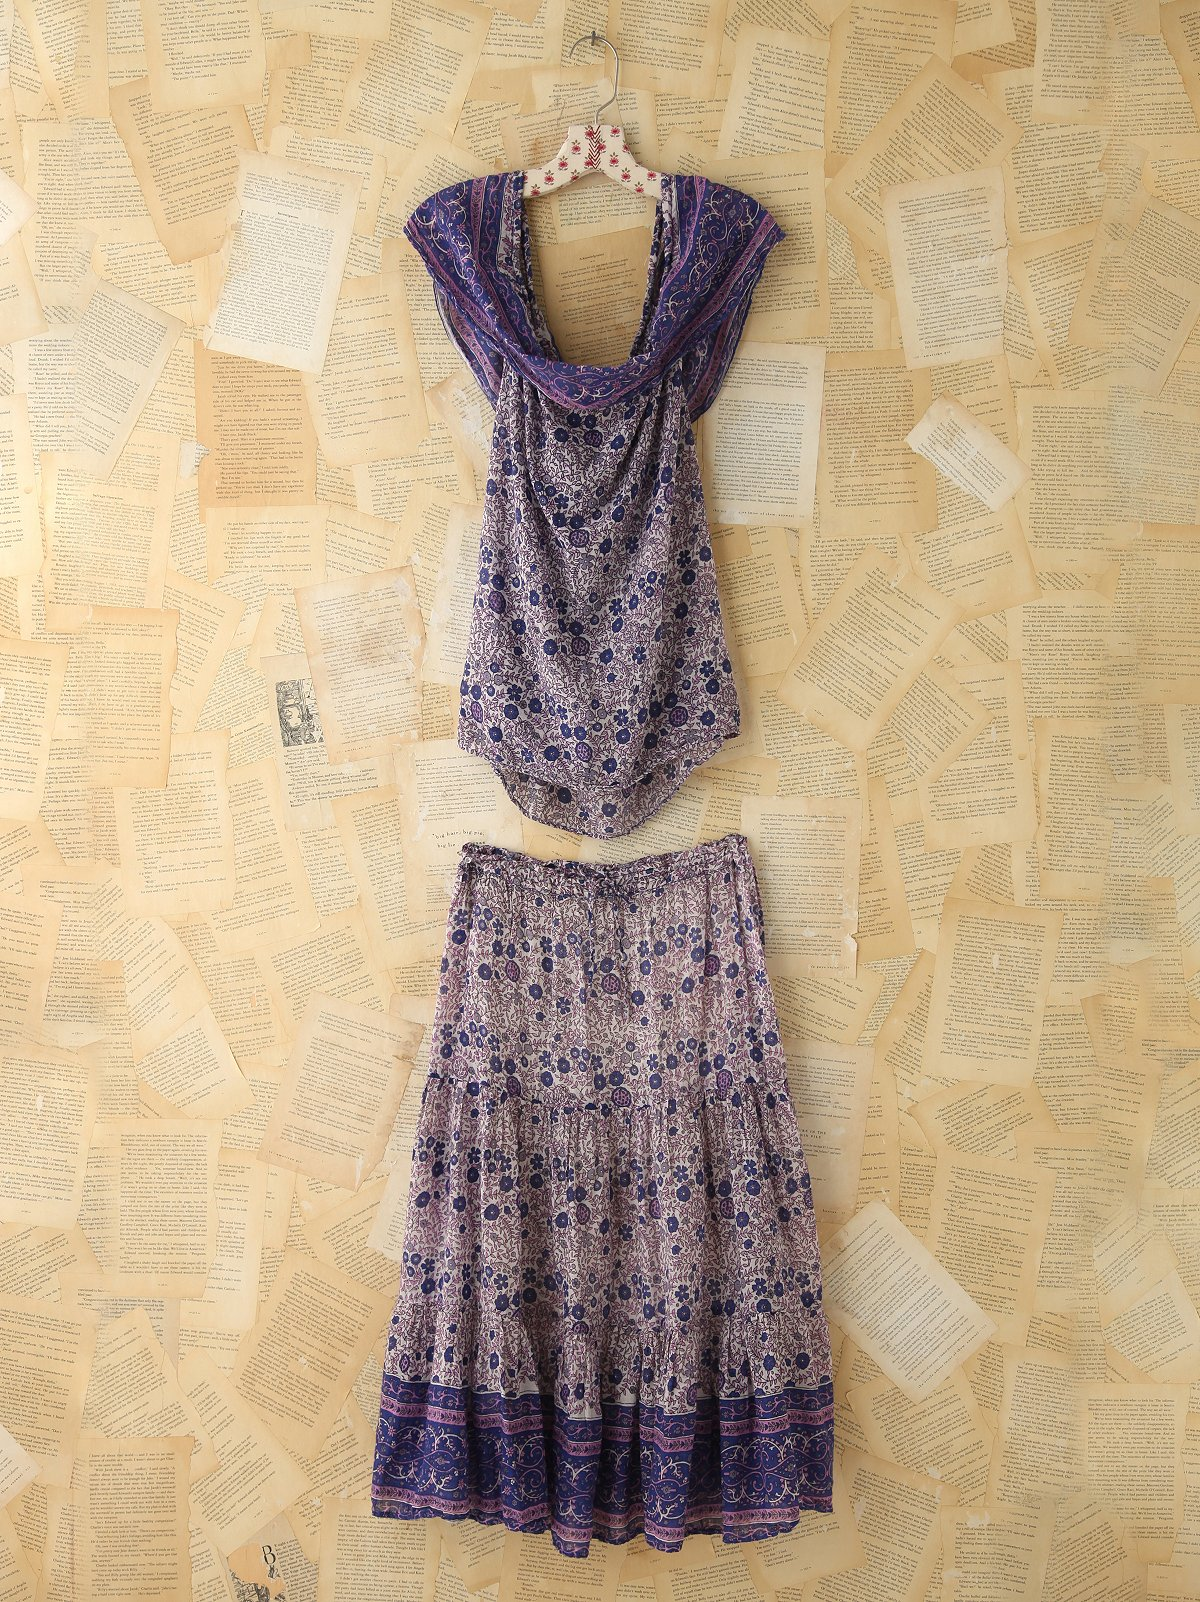 Vintage Floral Printed Skirt and Tank